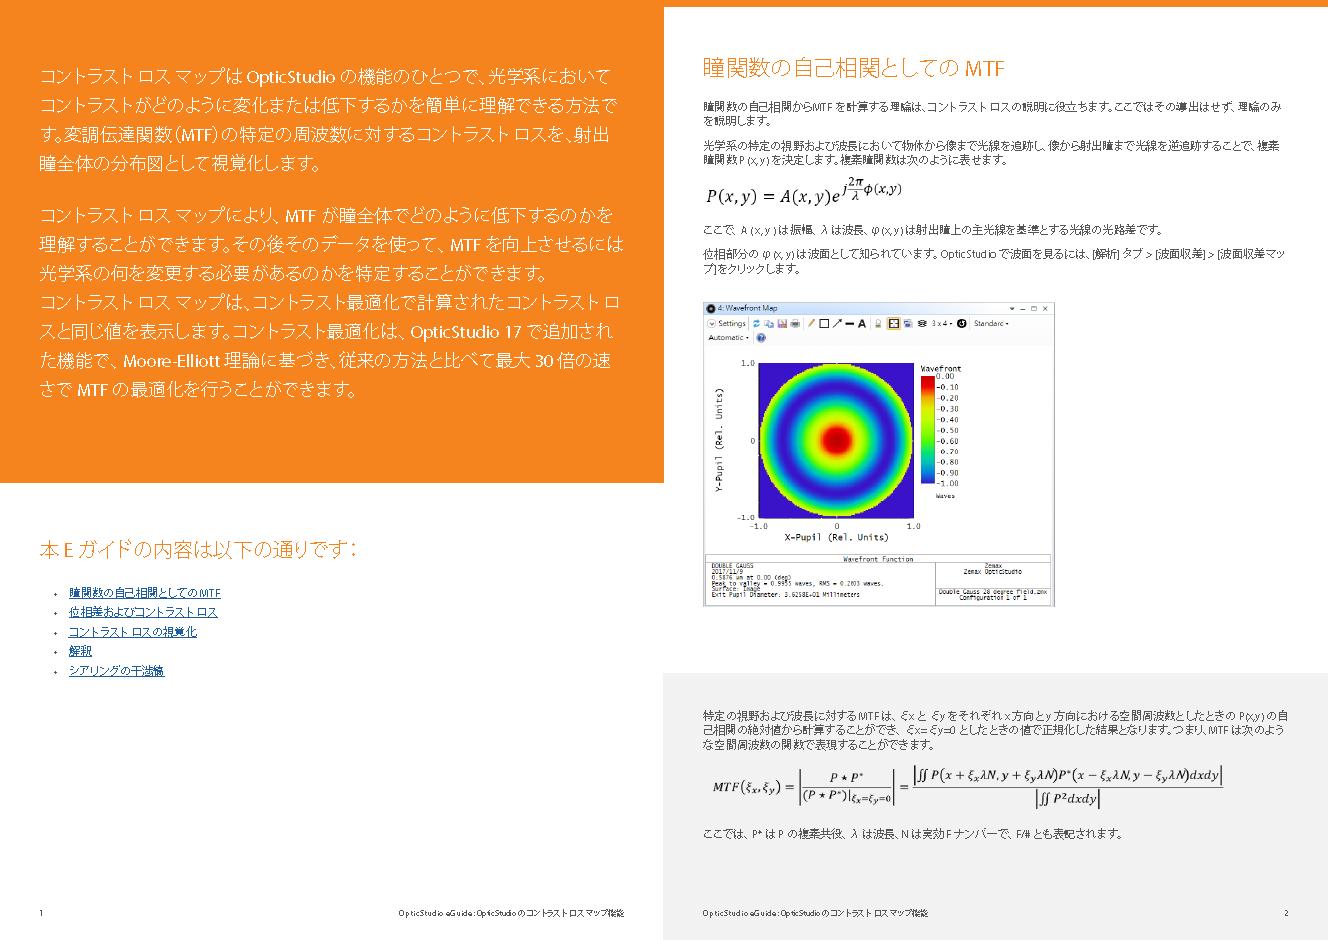 OpticStudio コントラスト ロス マップ機能 Sneak Preview